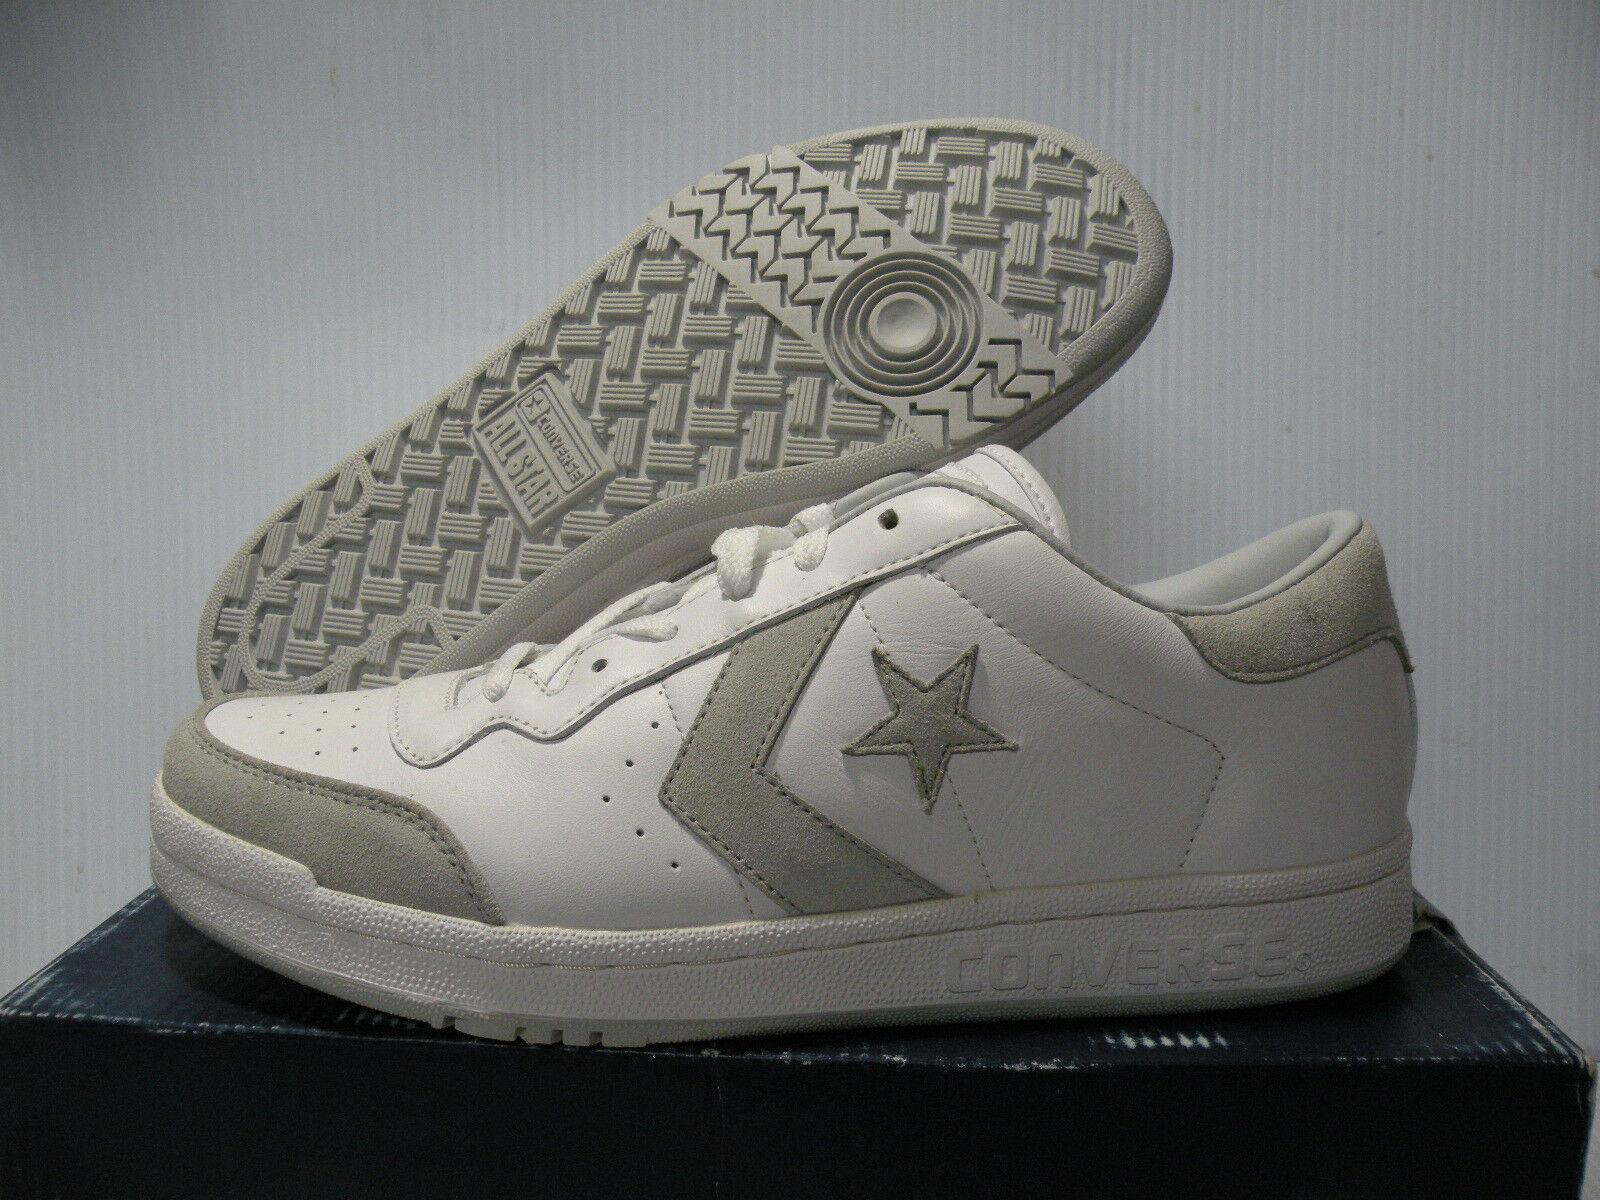 CONVERSE PRO STAR OX WHITE/GRAY SNEAKERS SNEAKERS WHITE/GRAY Uomo Scarpe 1J546 SIZE 7 NEW cc3fe2